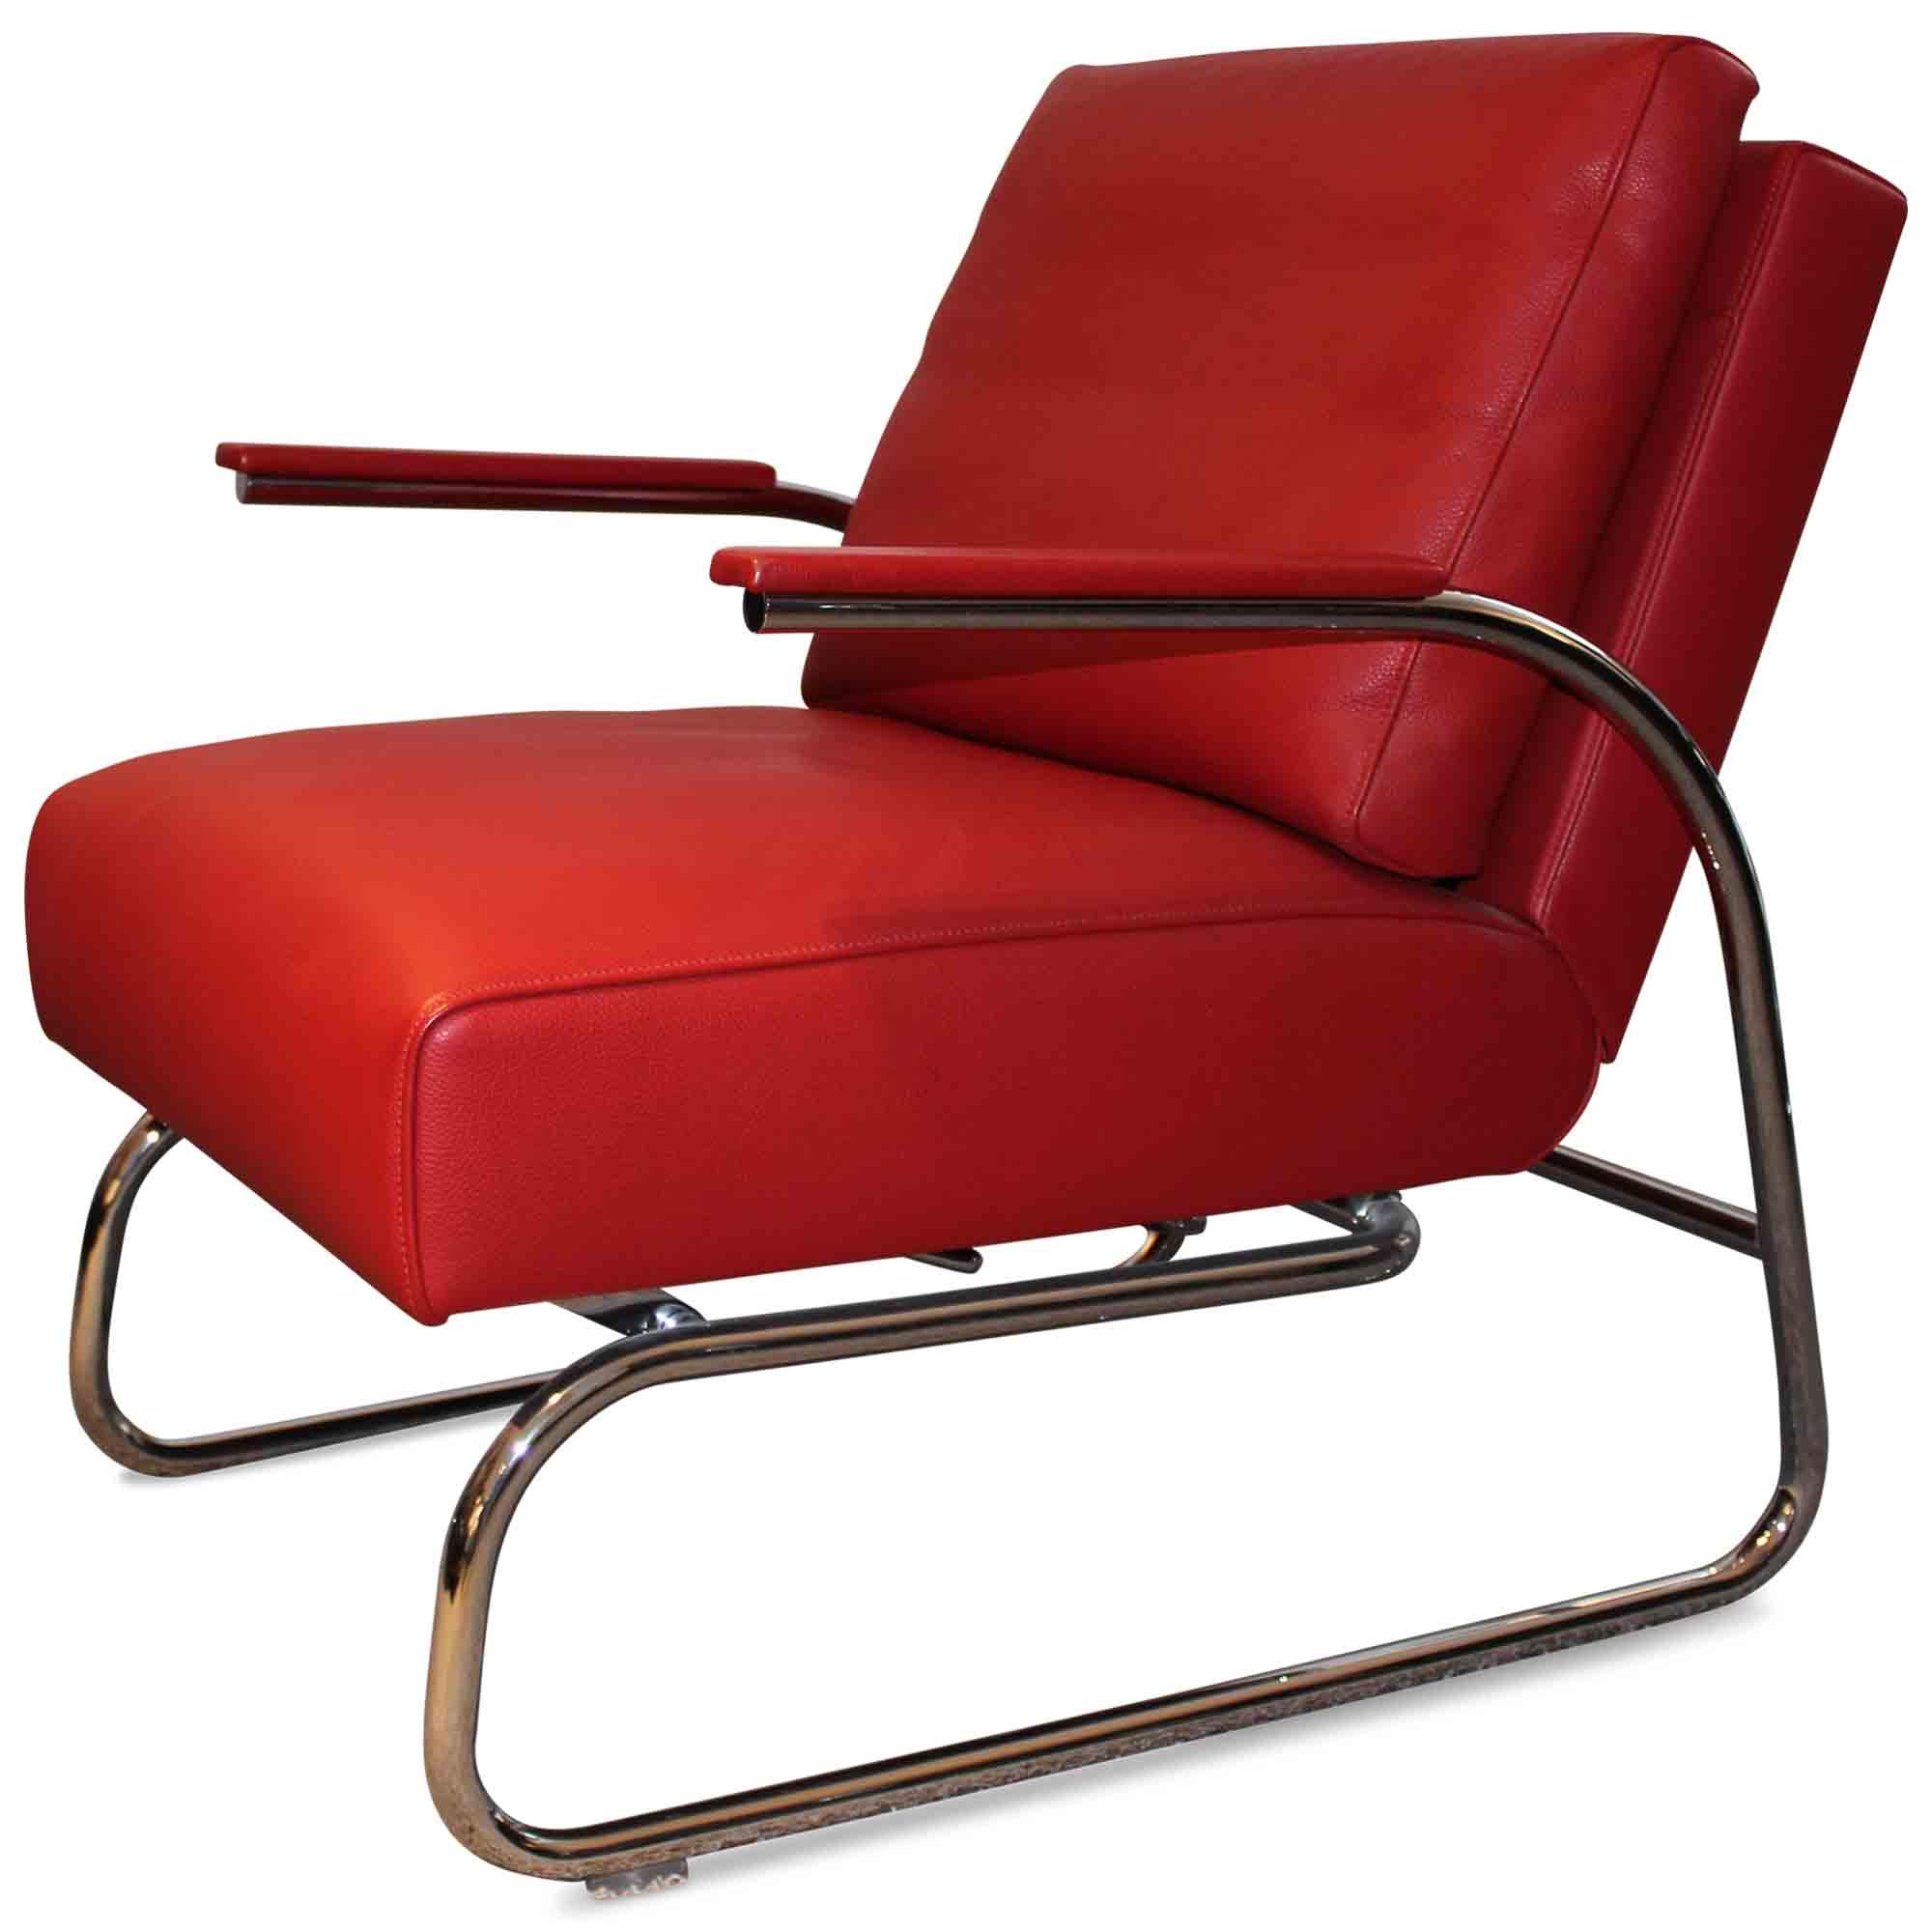 Sessel Gabo – FSM – Sessel – günstig kaufen | MöbelFirst